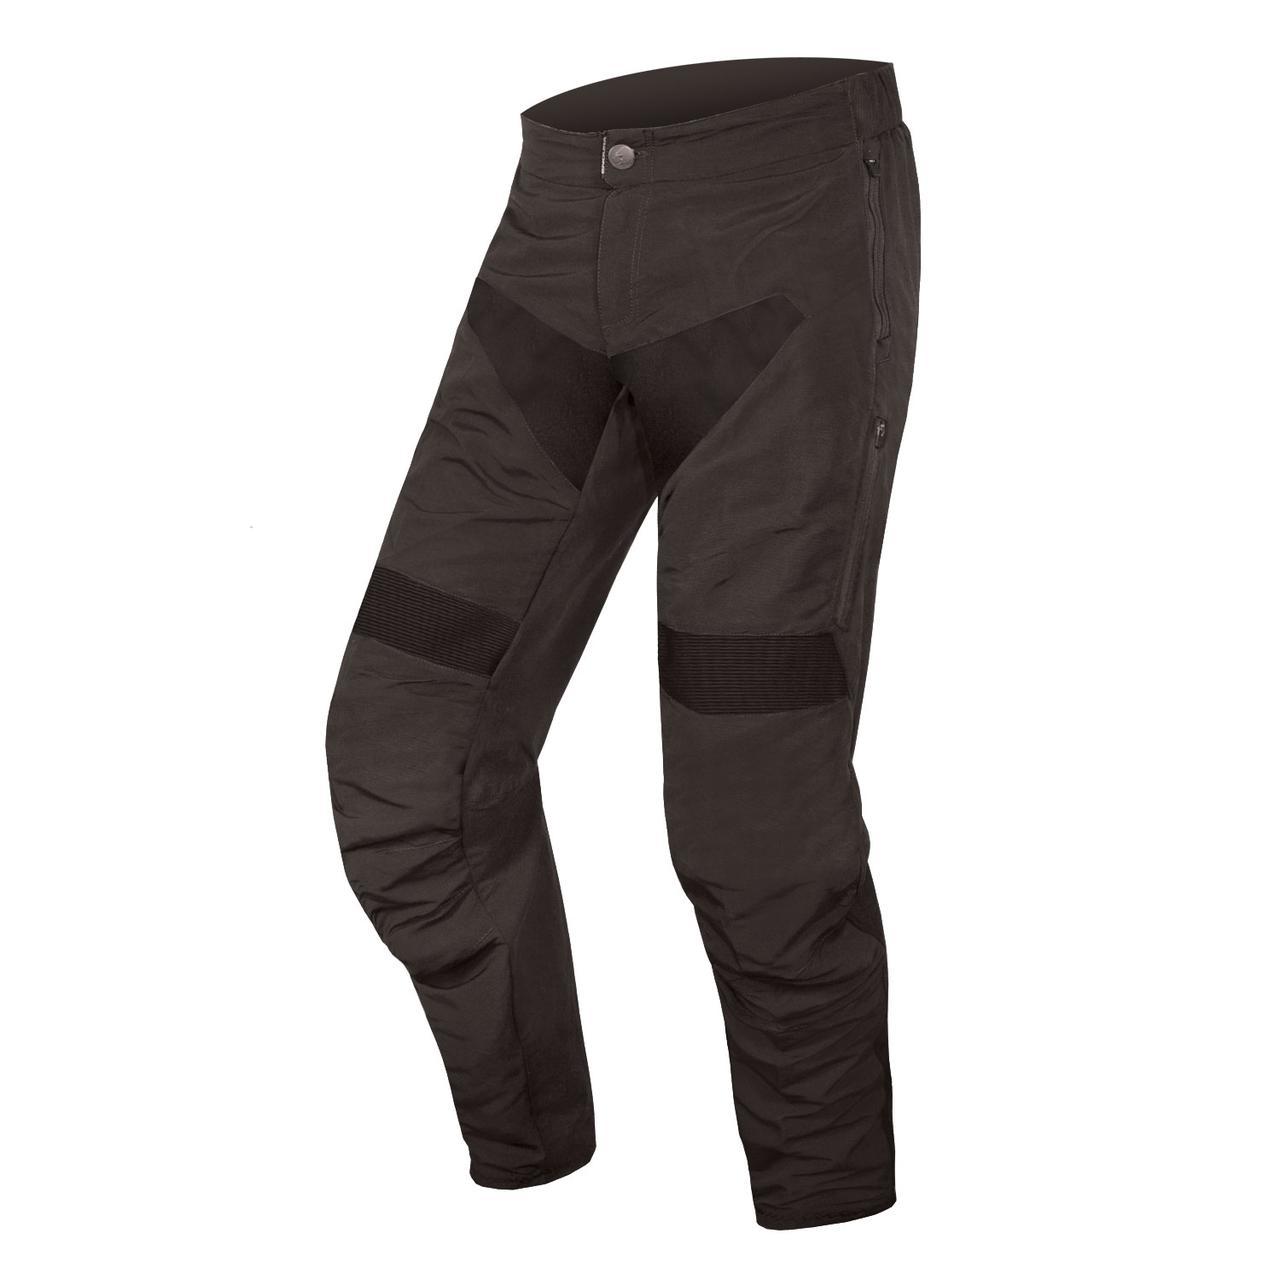 Endura  брюки мужские SingleTrack